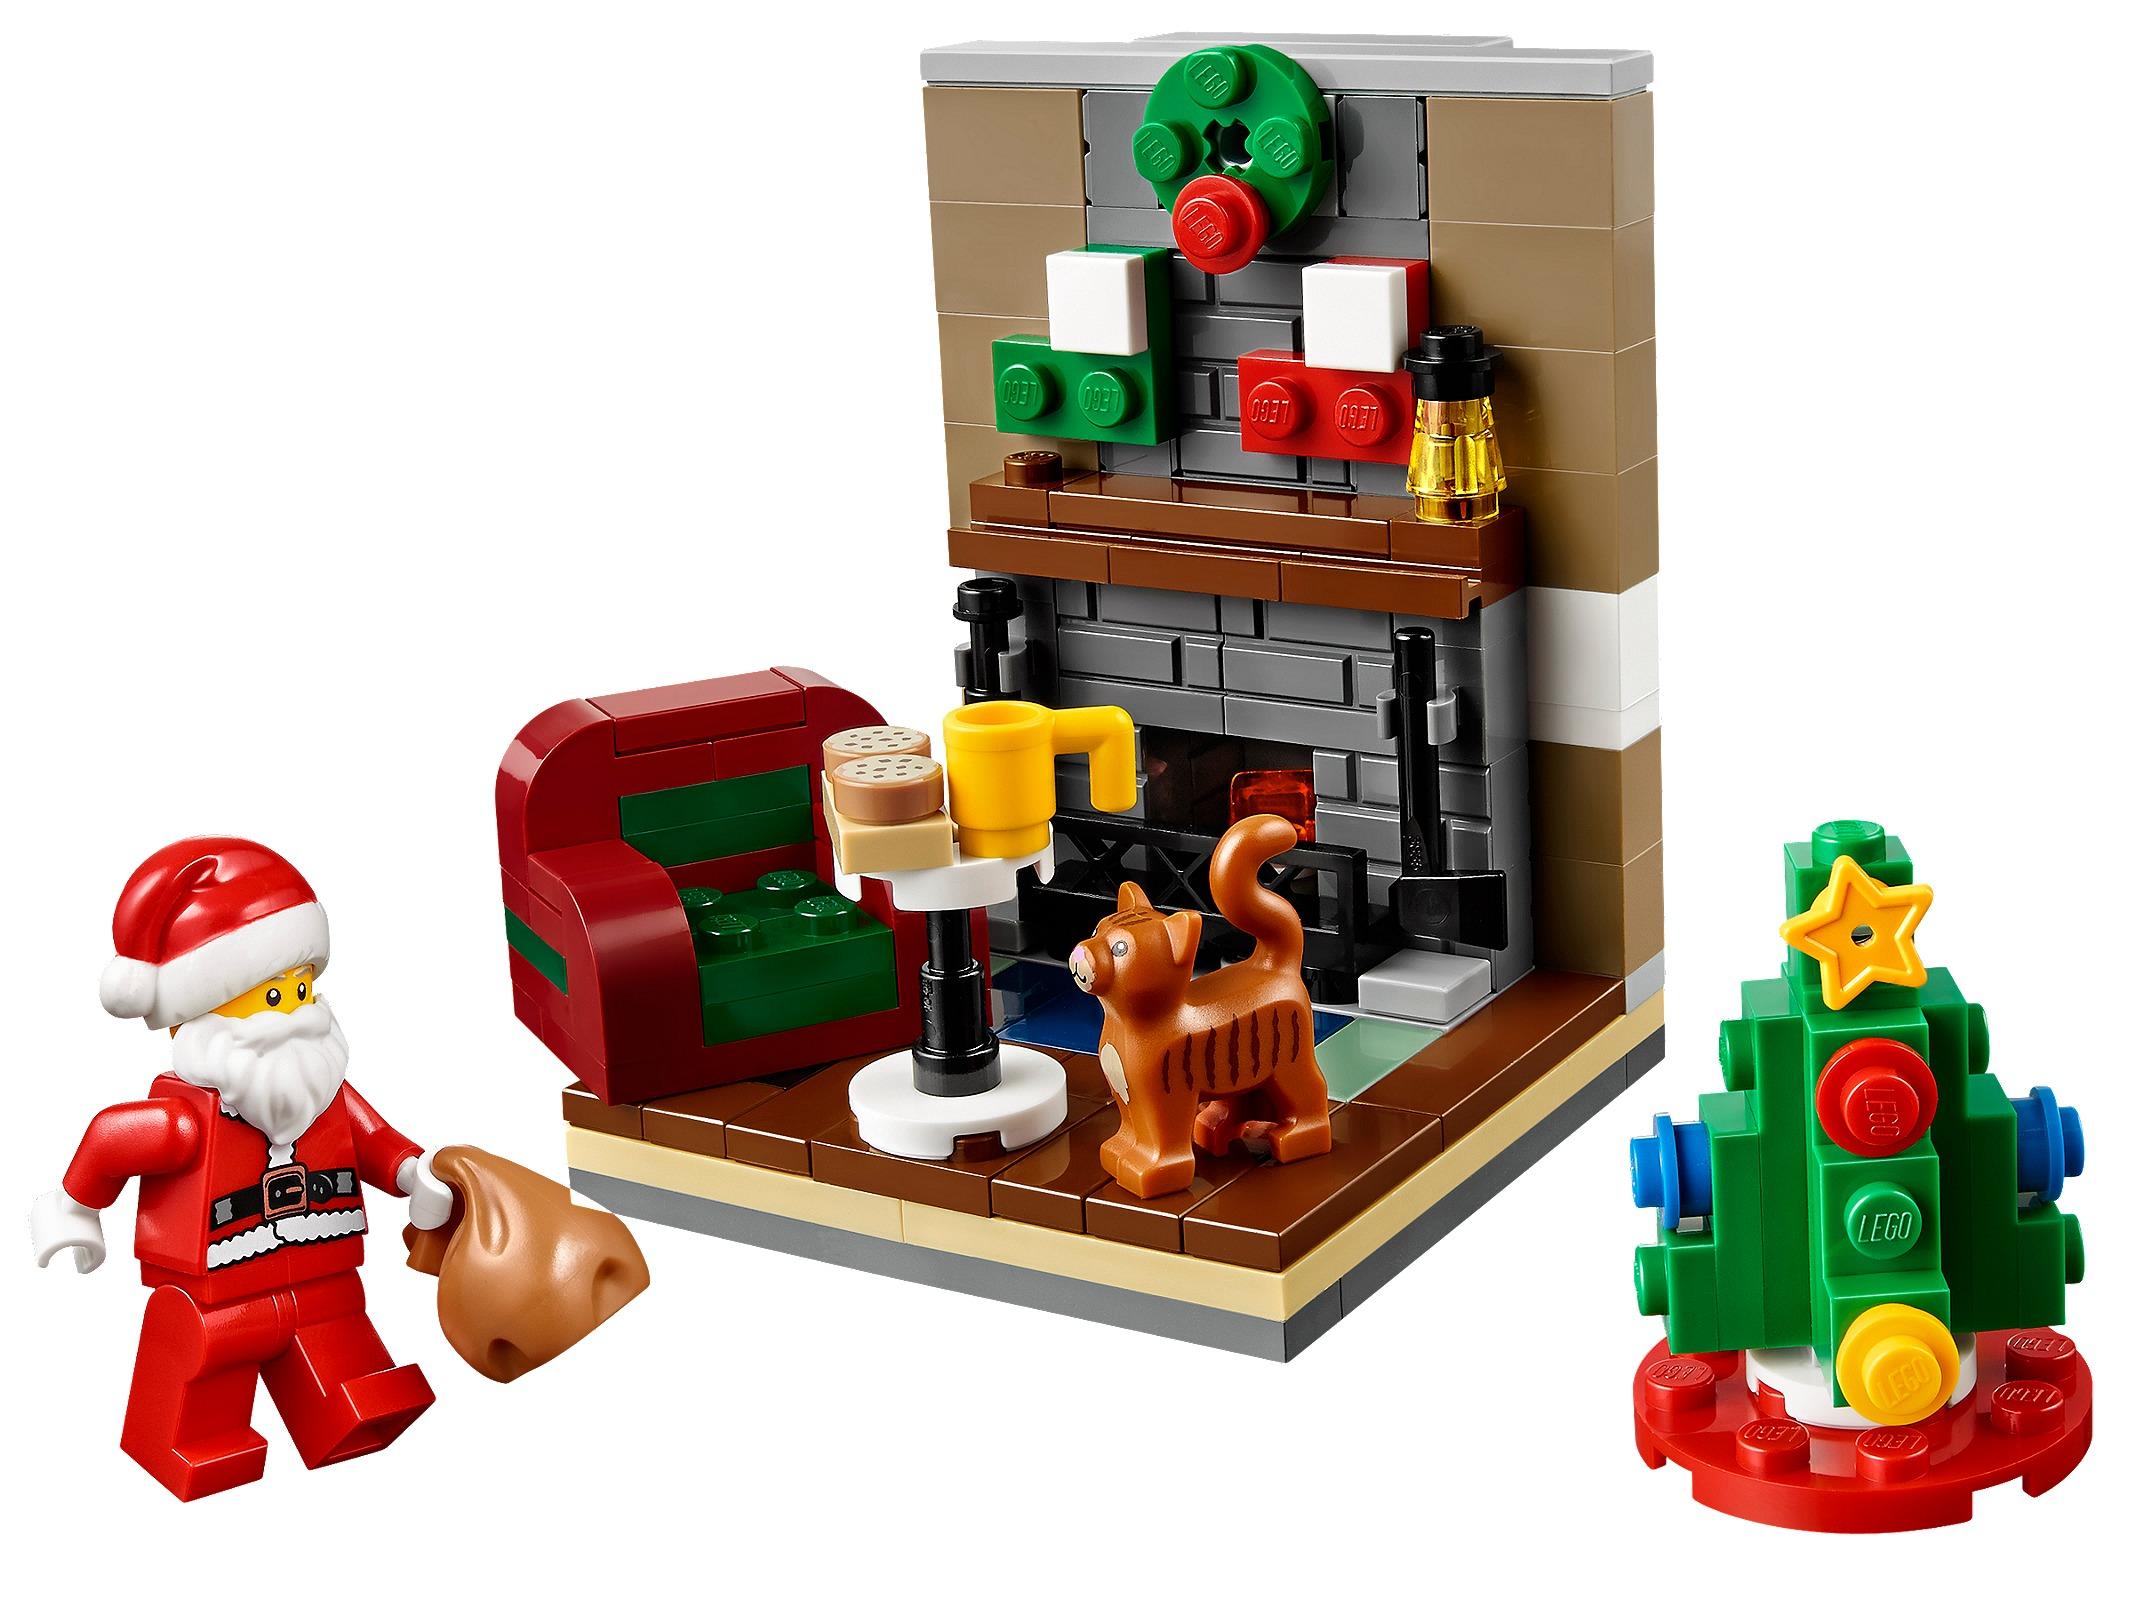 LEGO 40138-1 Christmas Train - Ninja Brick